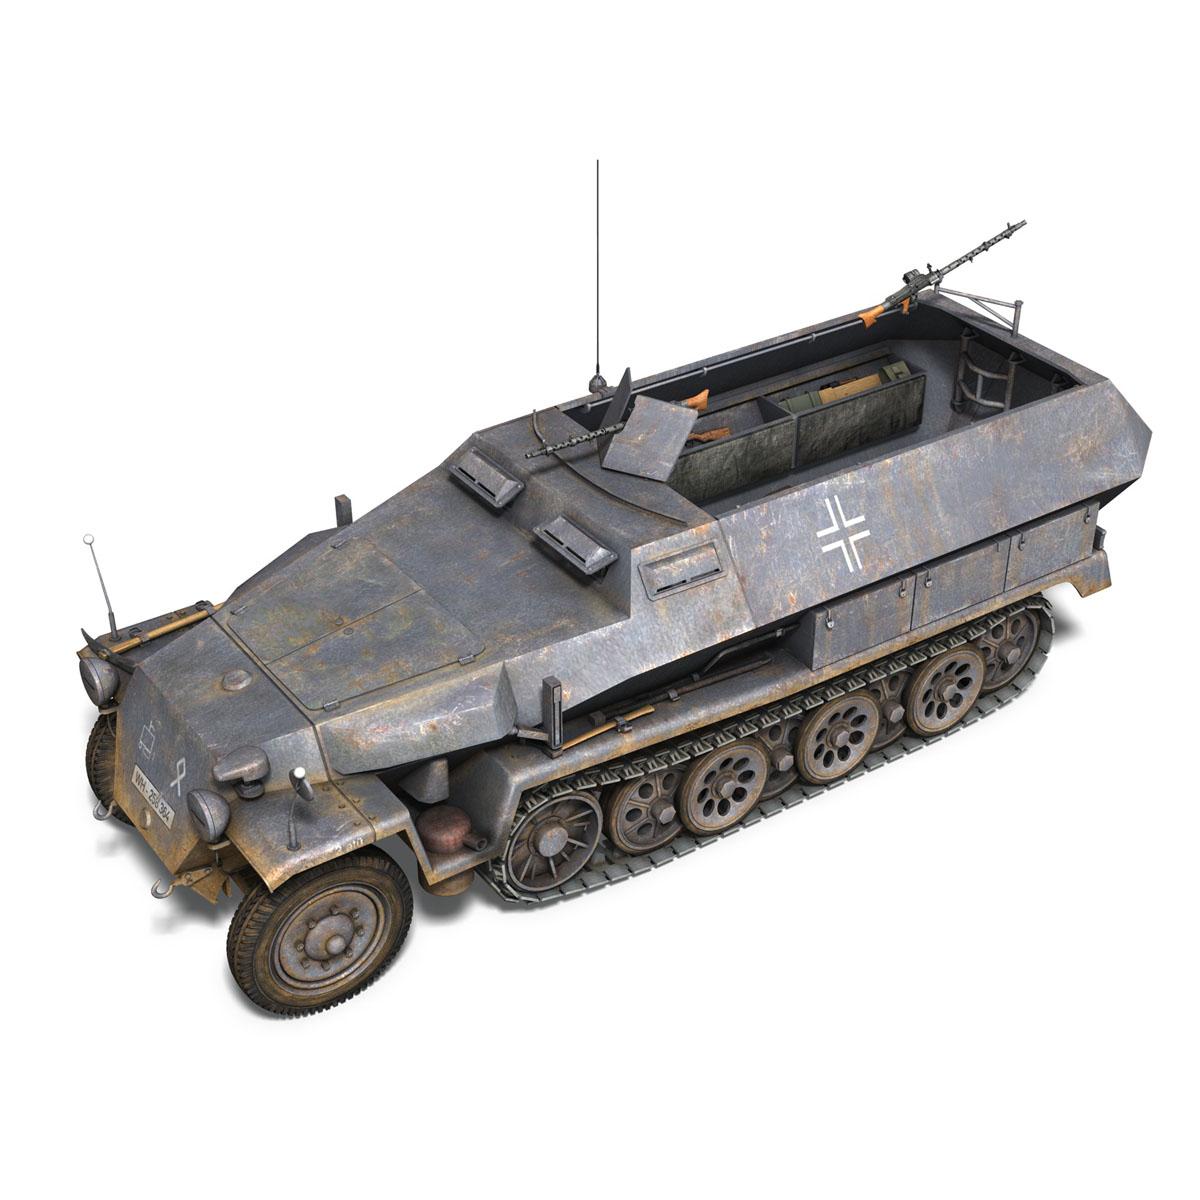 sd.kfz 251 1 ausf.c – half-track 3d model 3ds fbx c4d lwo obj 201392